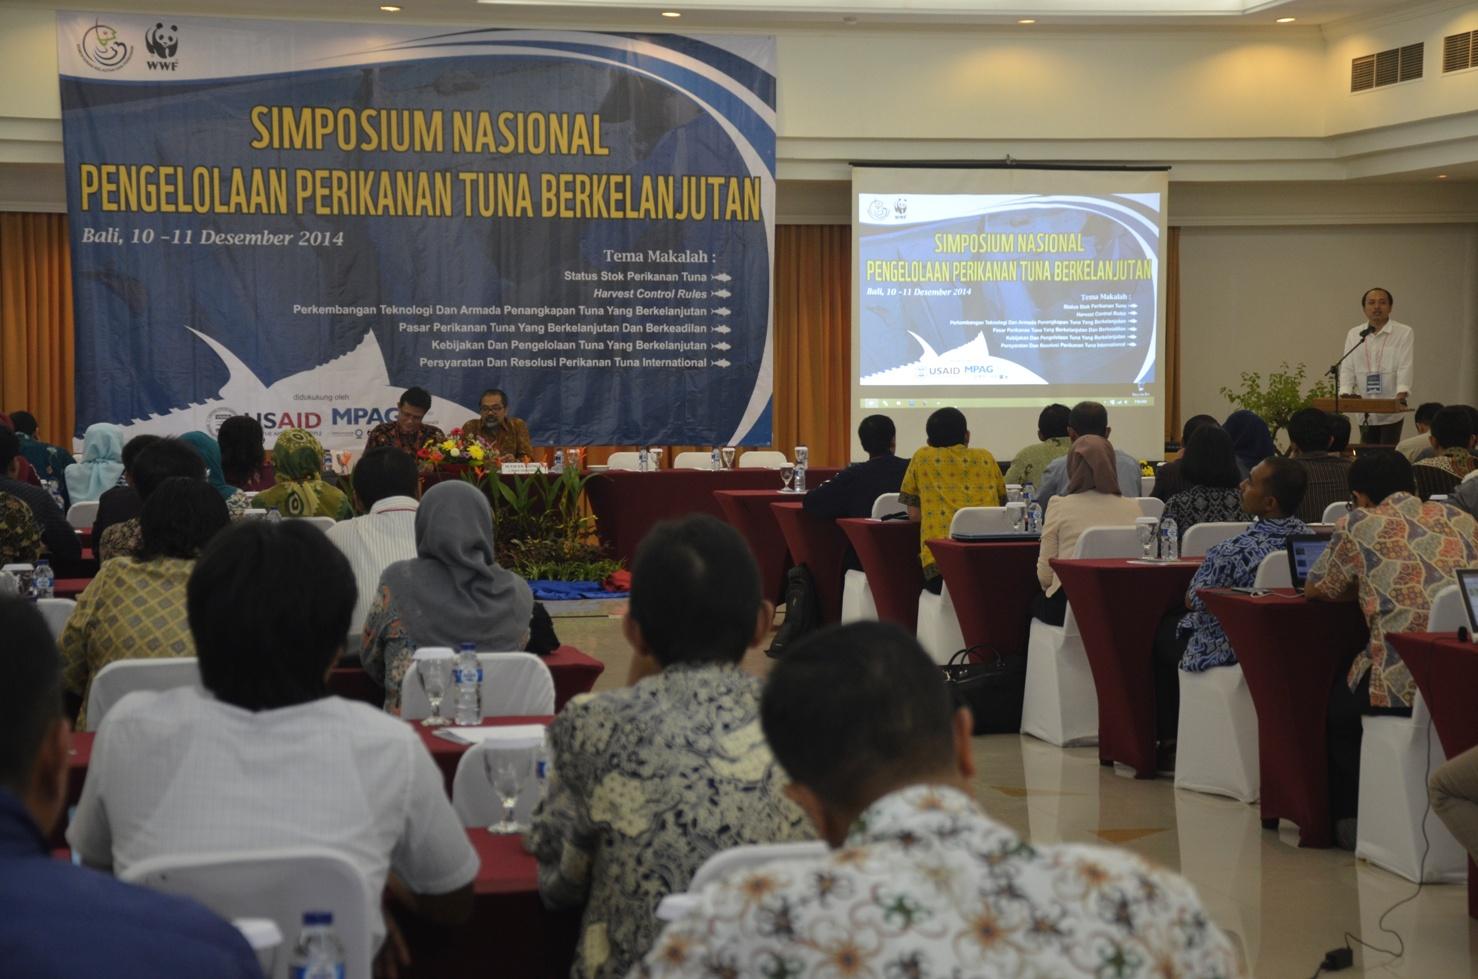 Gencarkan Upaya Praktik Perikanan Berkelanjutan Lewat Simposium Tuna Nasional